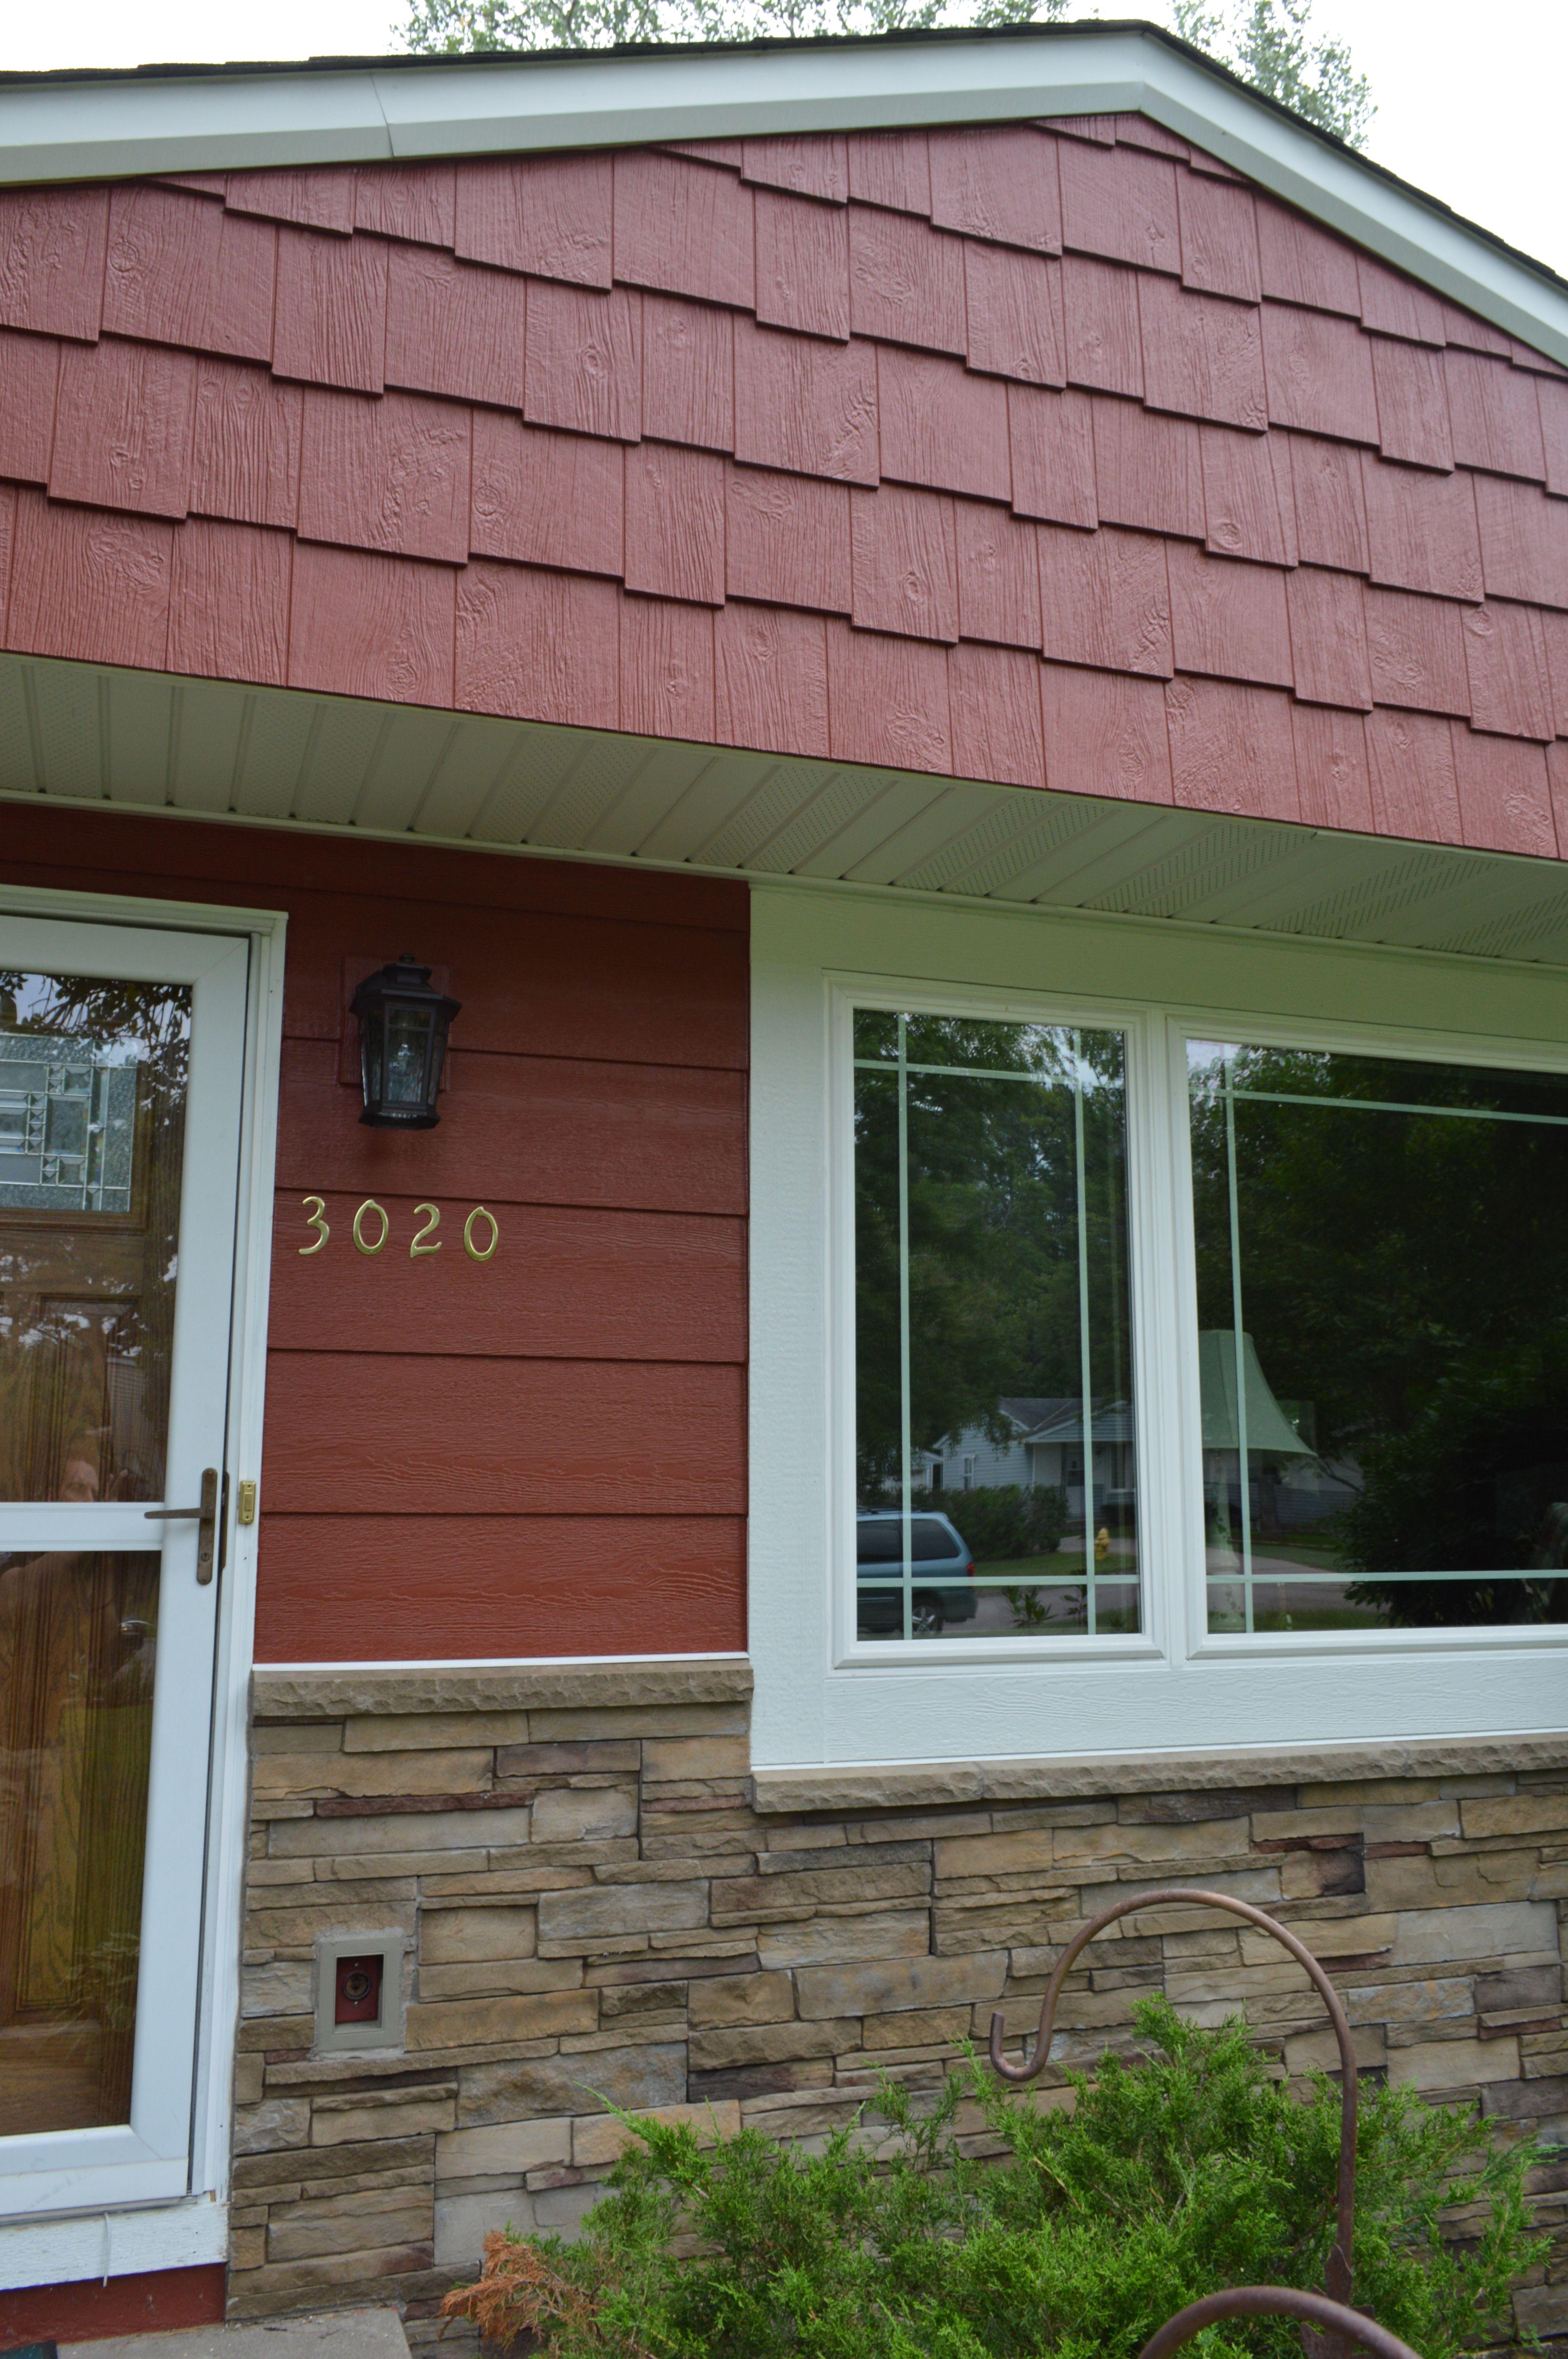 Lp Smartside Siding Autumn Red Installing Siding Siding Engineered Wood Siding